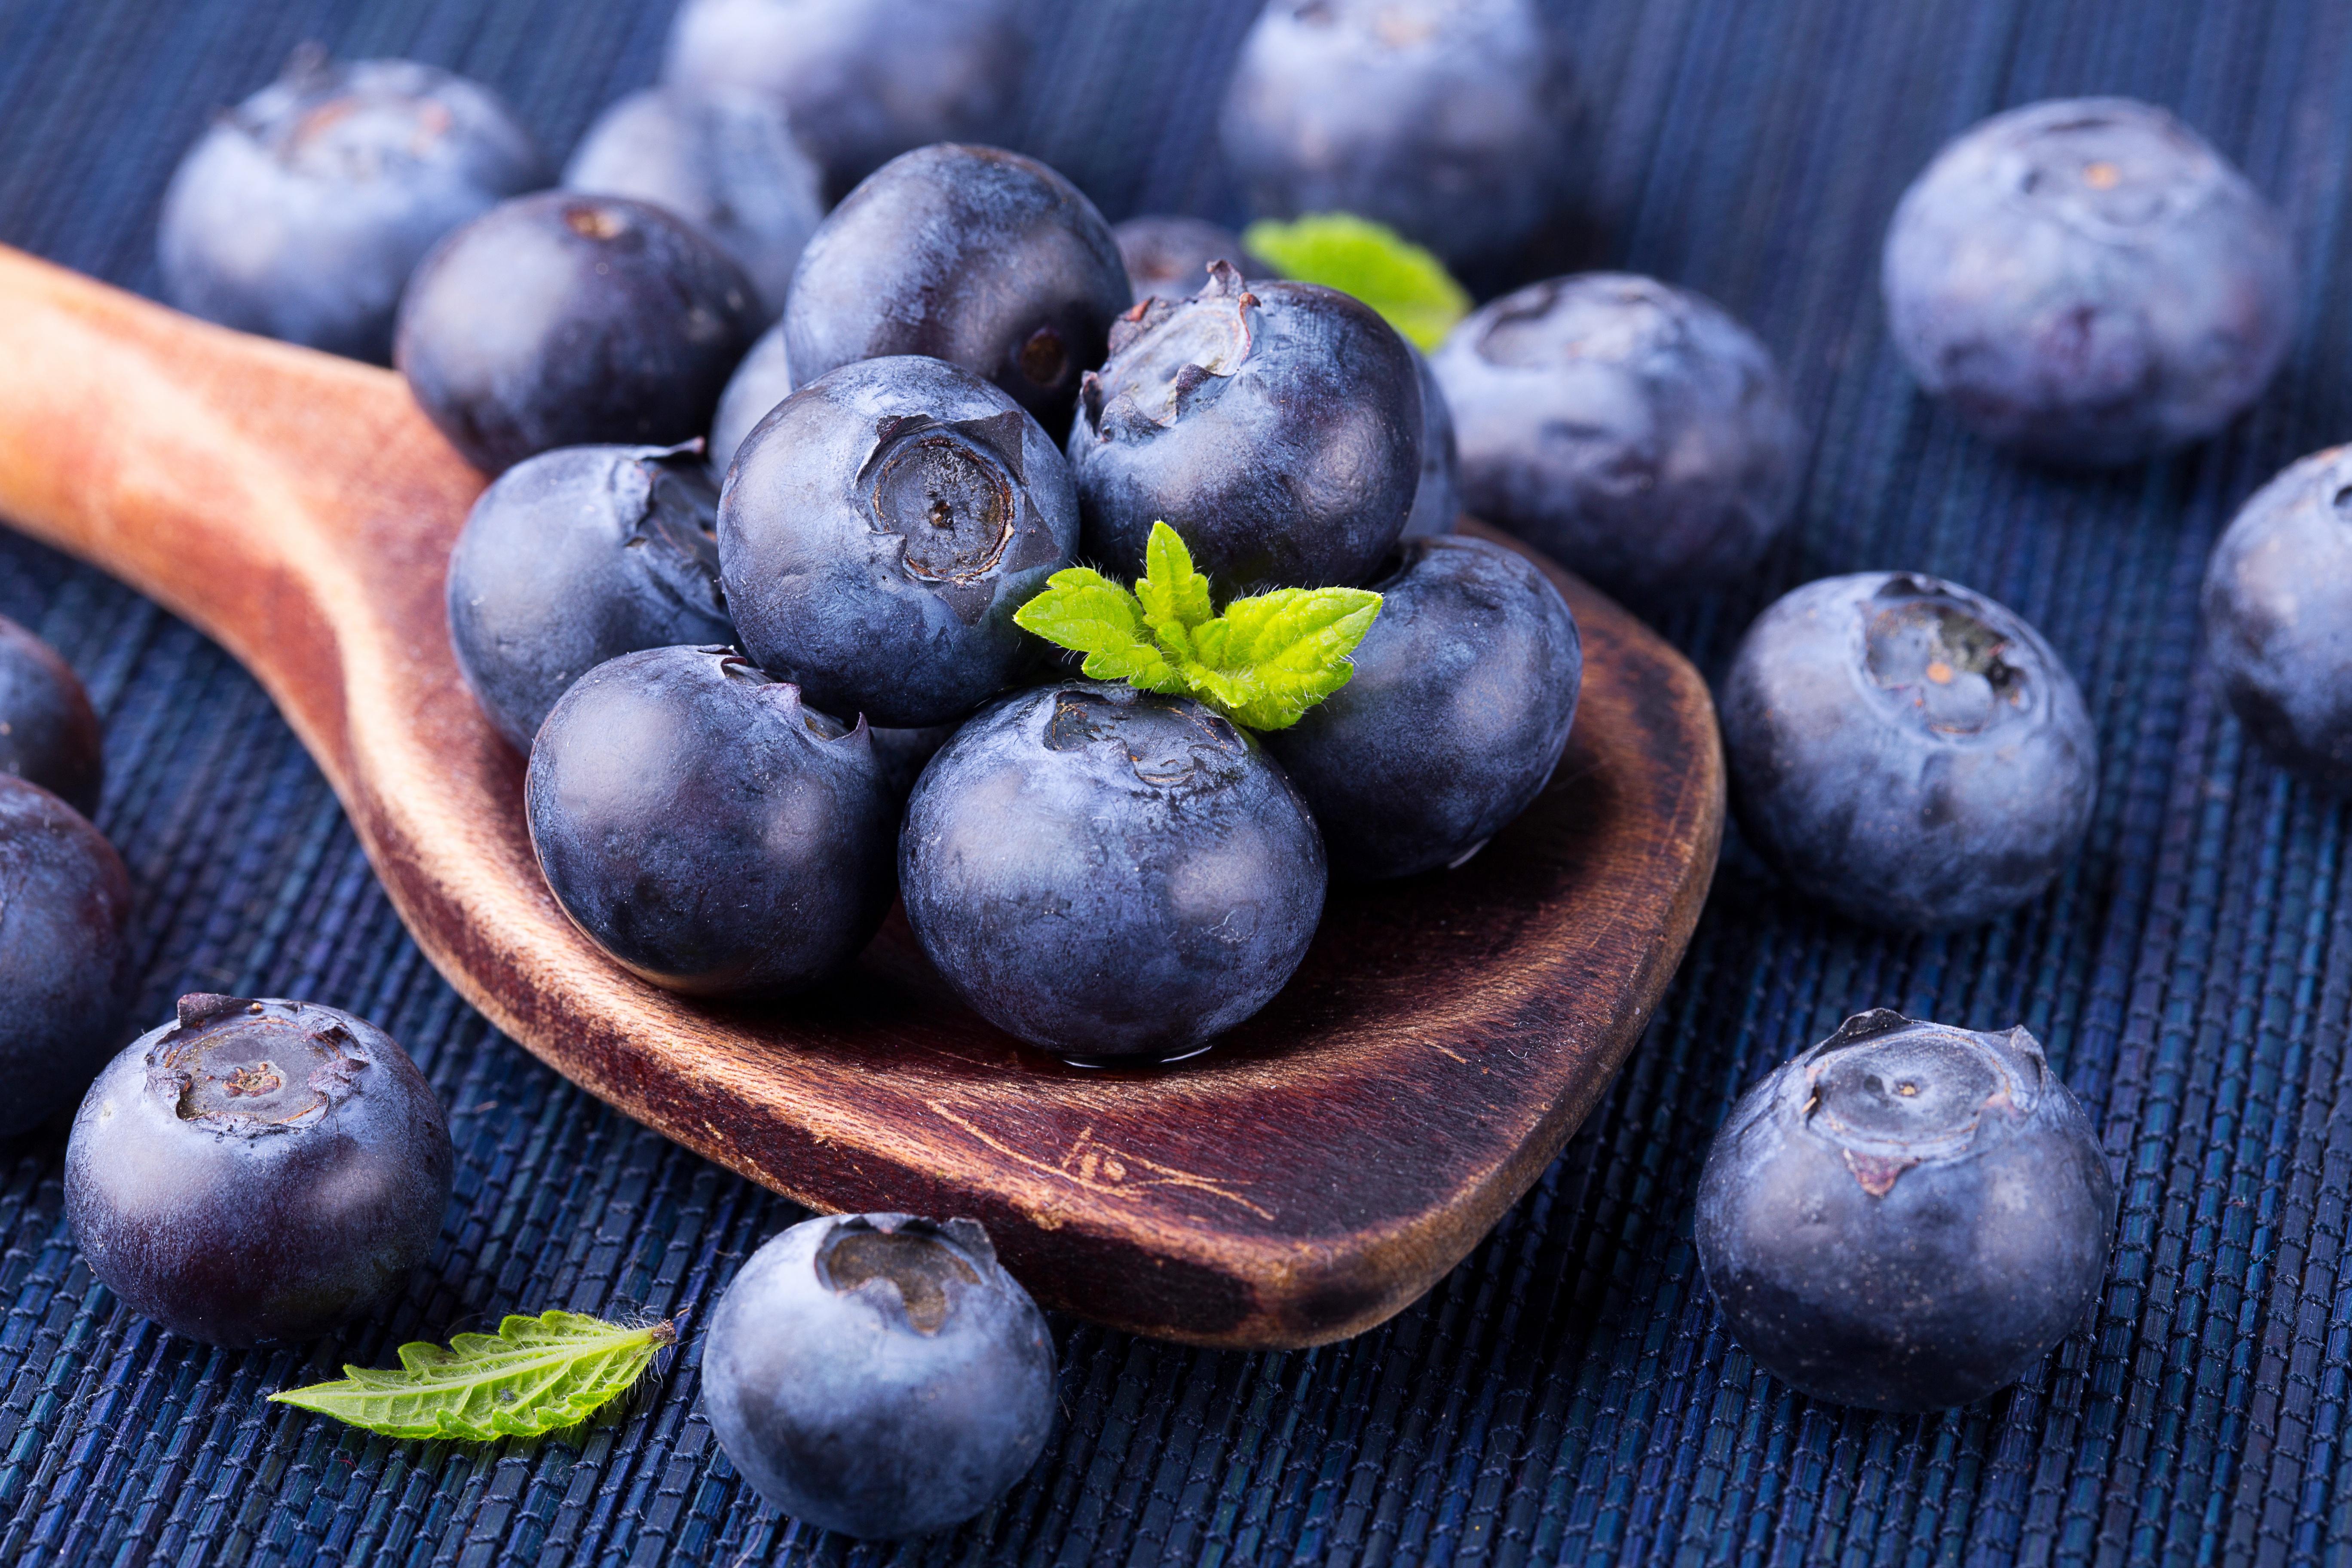 Berry Blueberry Fruit 5472x3648